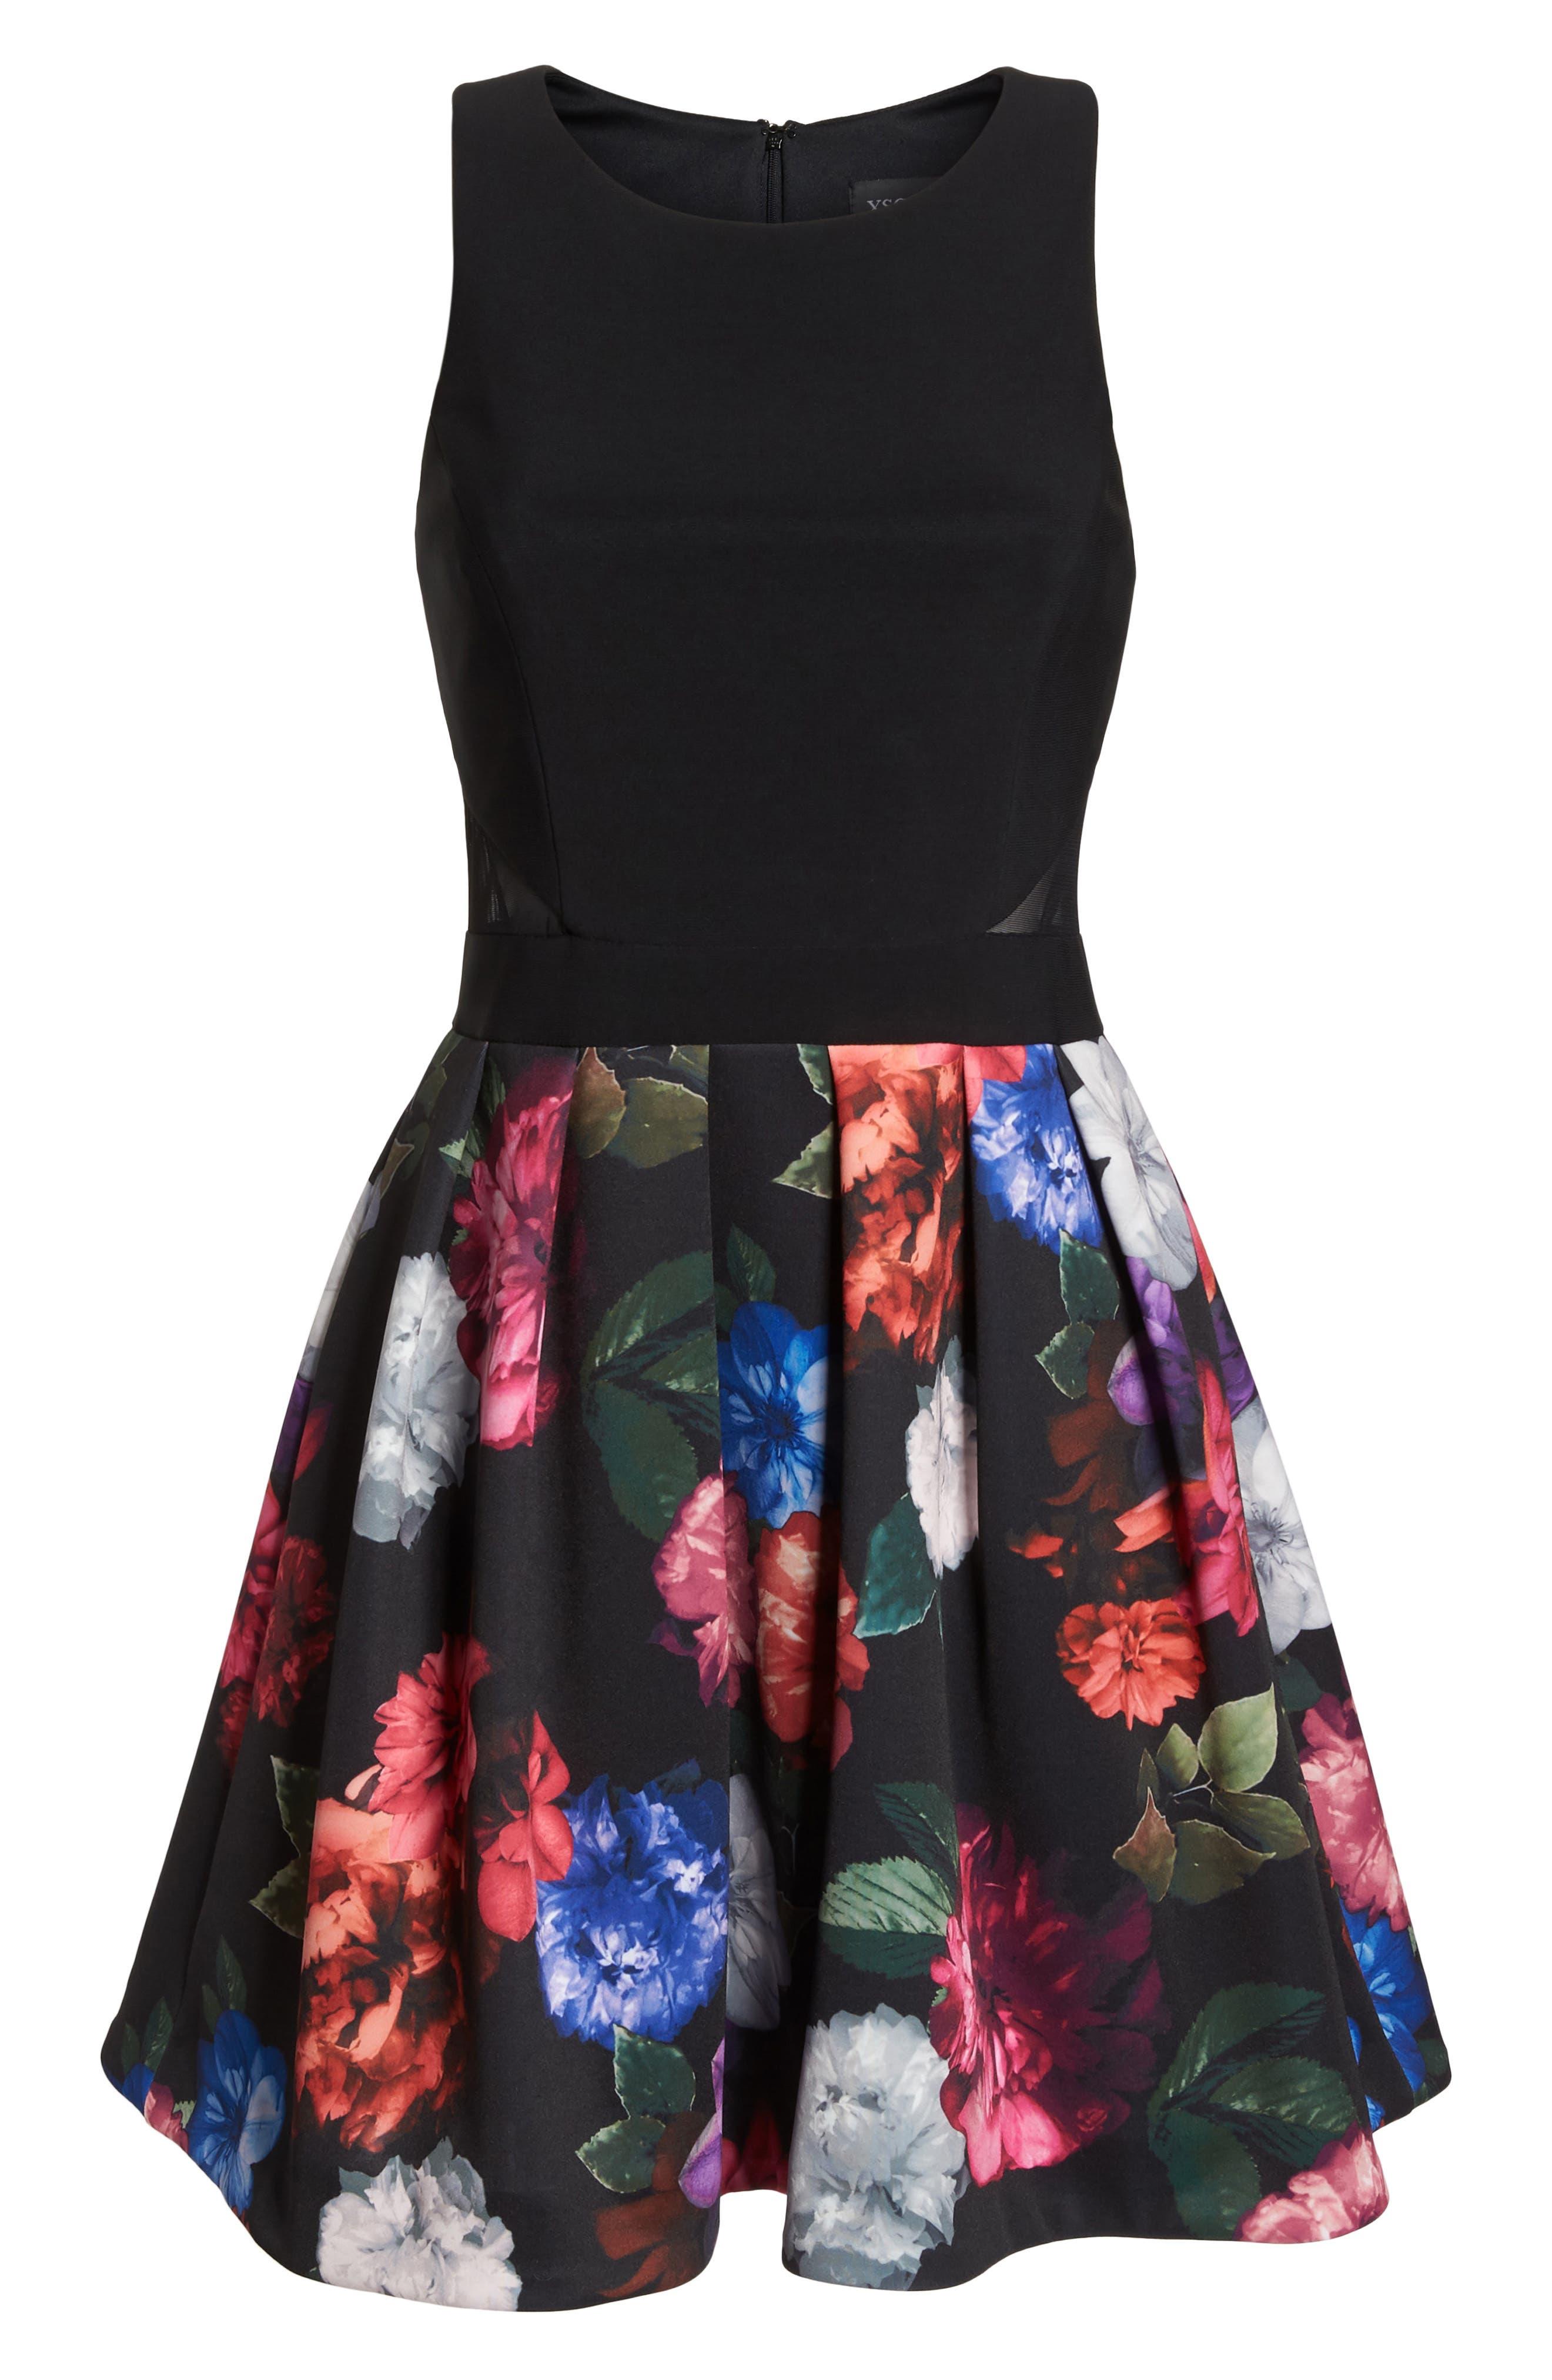 Floral Print Fit & Flare Dress,                             Alternate thumbnail 7, color,                             BLACK/ PURPLE